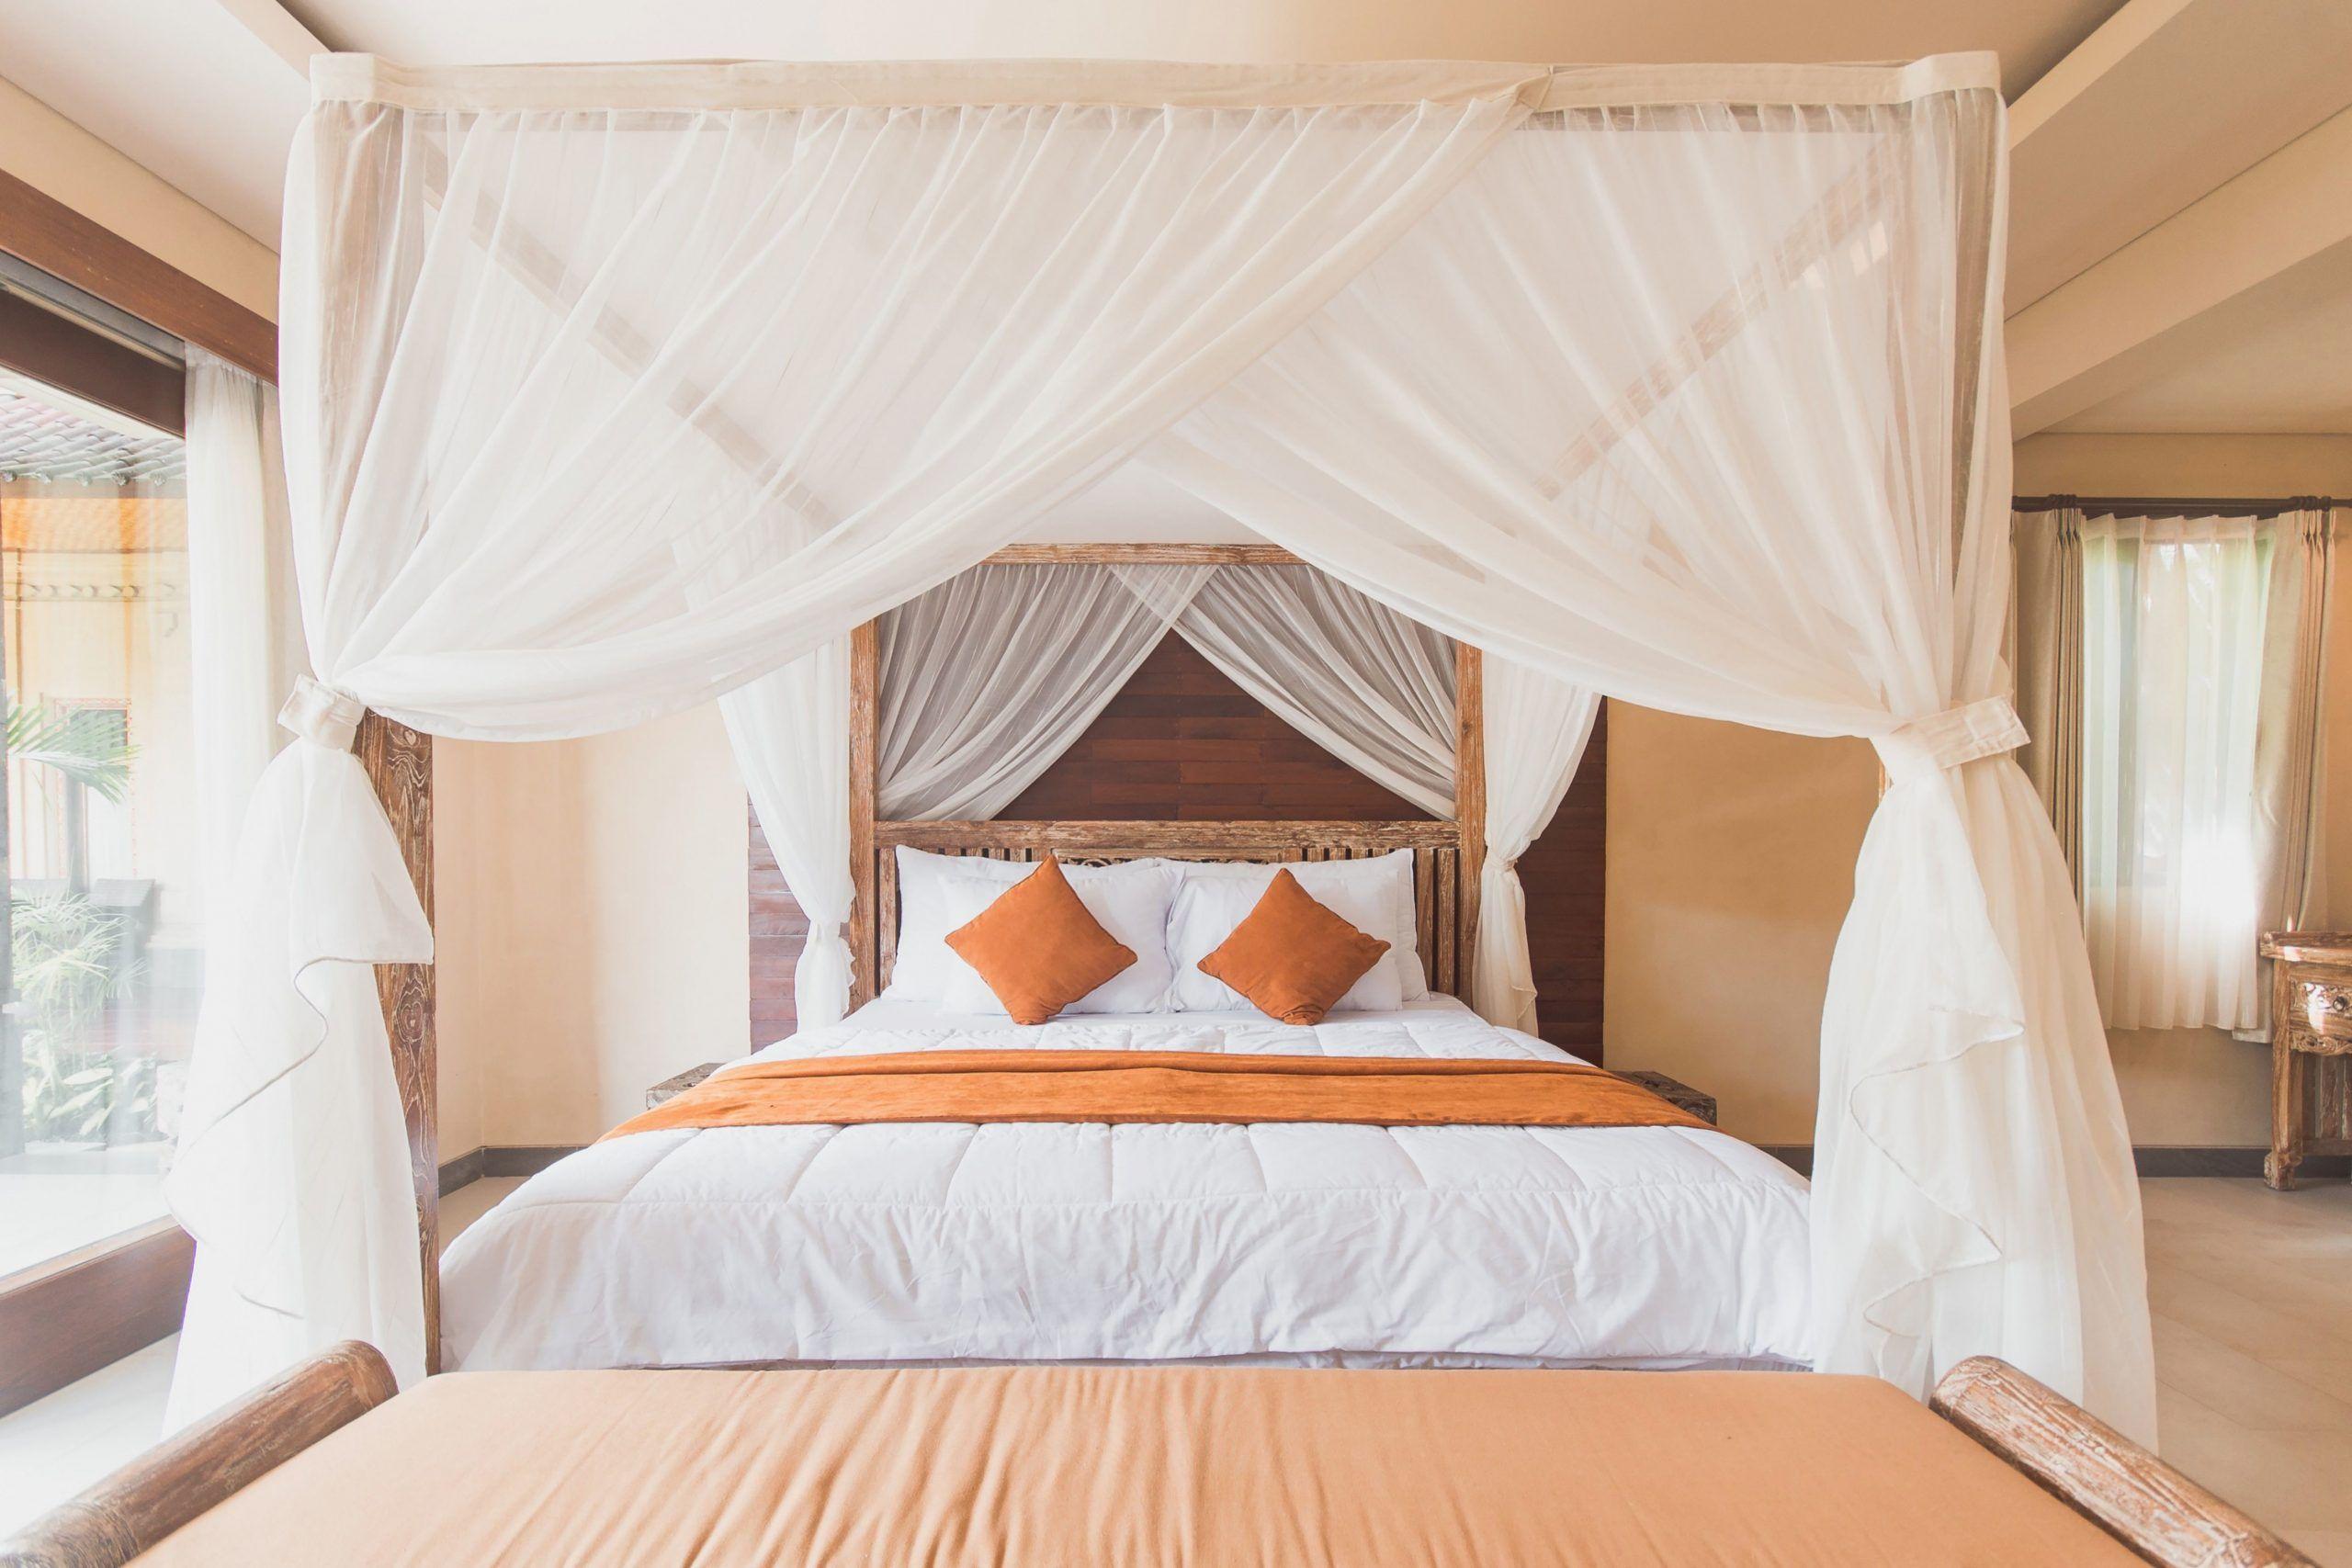 The Cheapest Way To Earn Your Free Ticket To Orange Bedroom Ideas In 2020 Bedroom Orange Creative Bedroom Yellow Bedroom